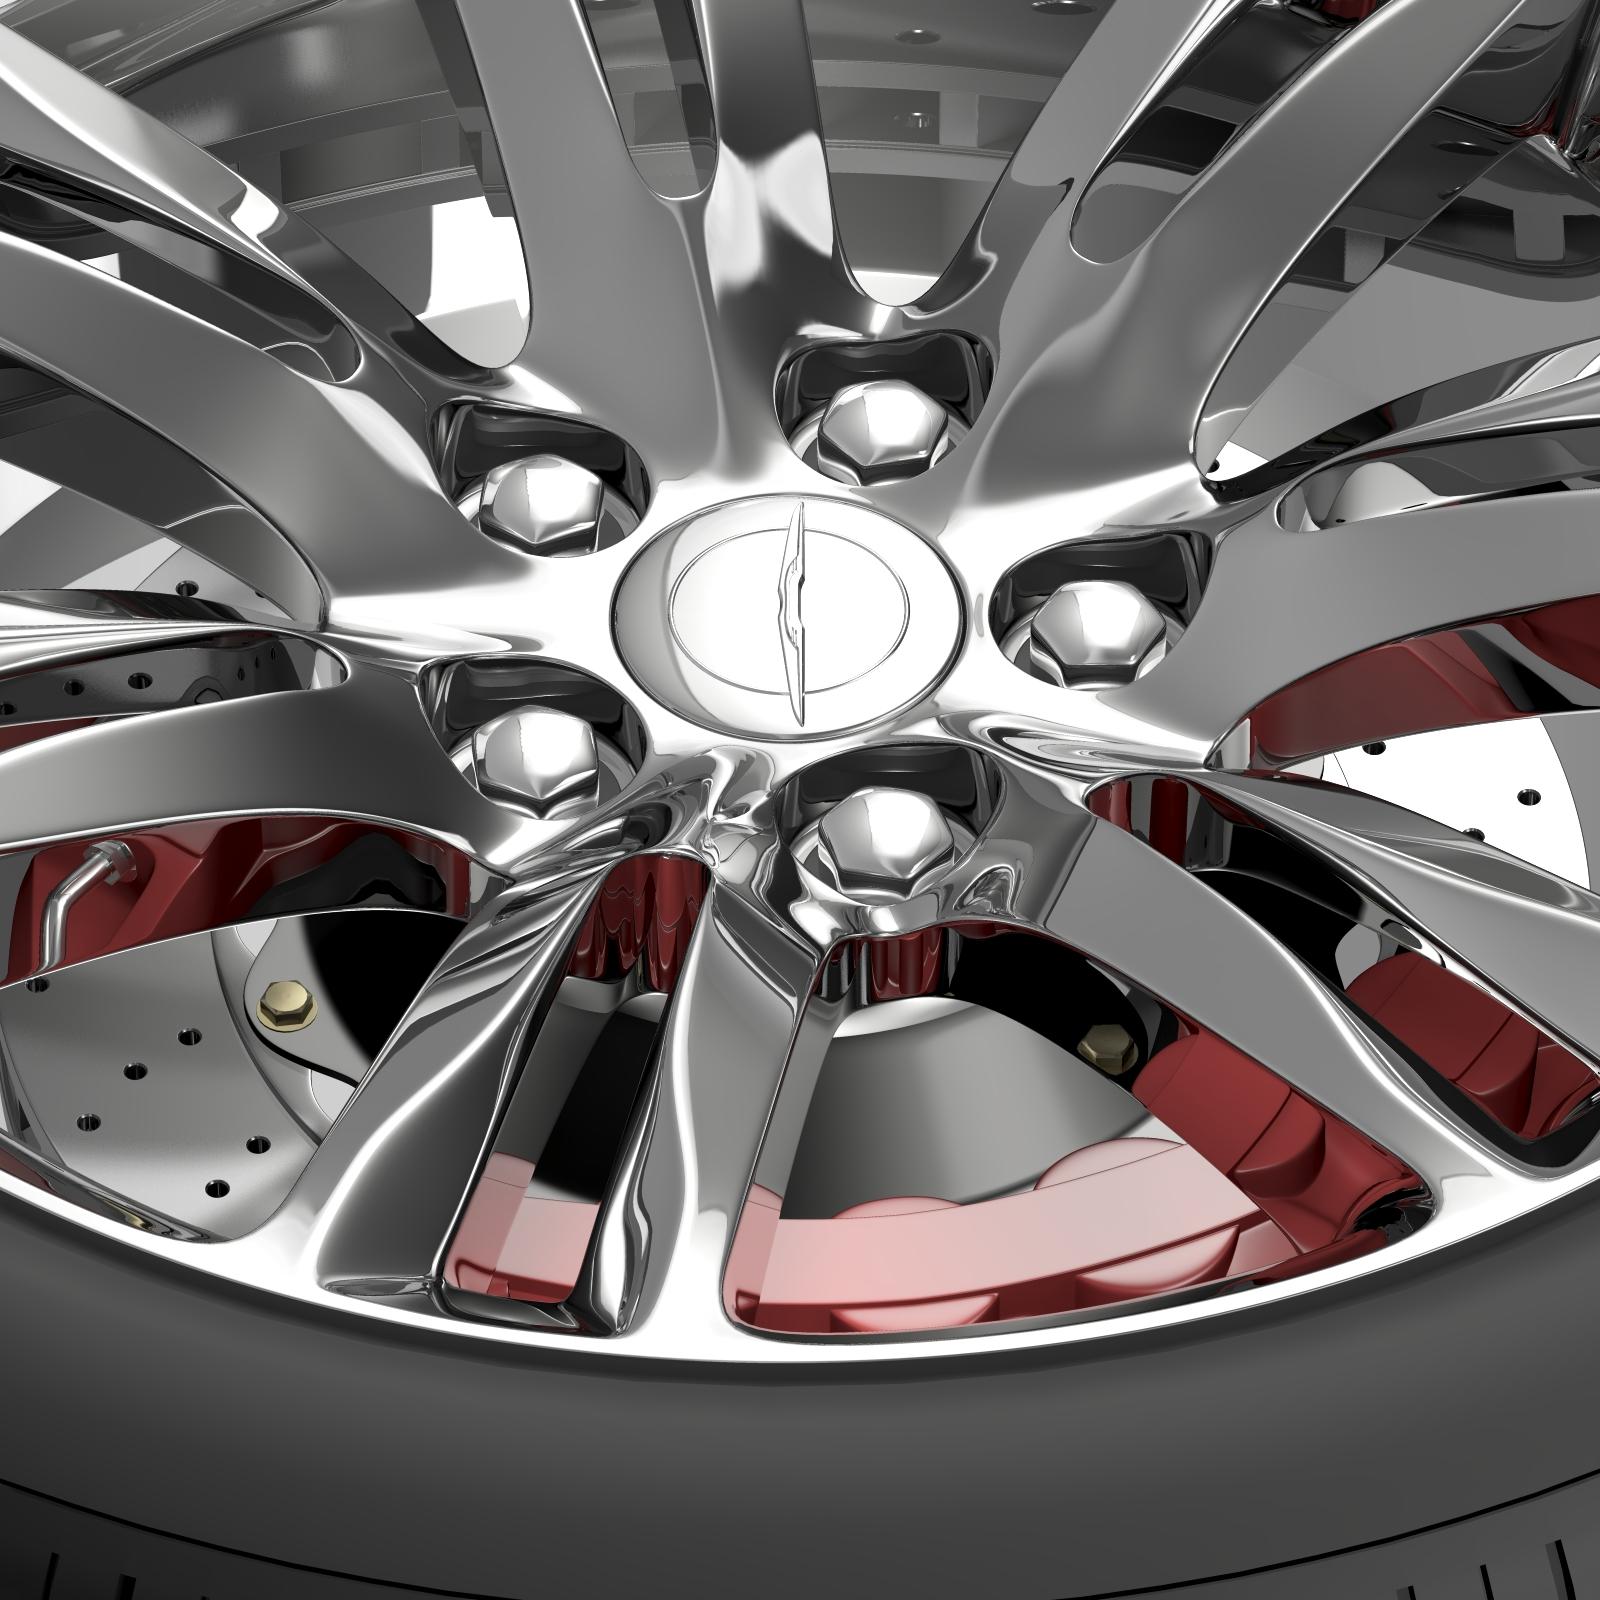 chrysler 300c 2015 wheel 3d model 3ds max fbx c4d lwo ma mb hrc xsi obj 212763